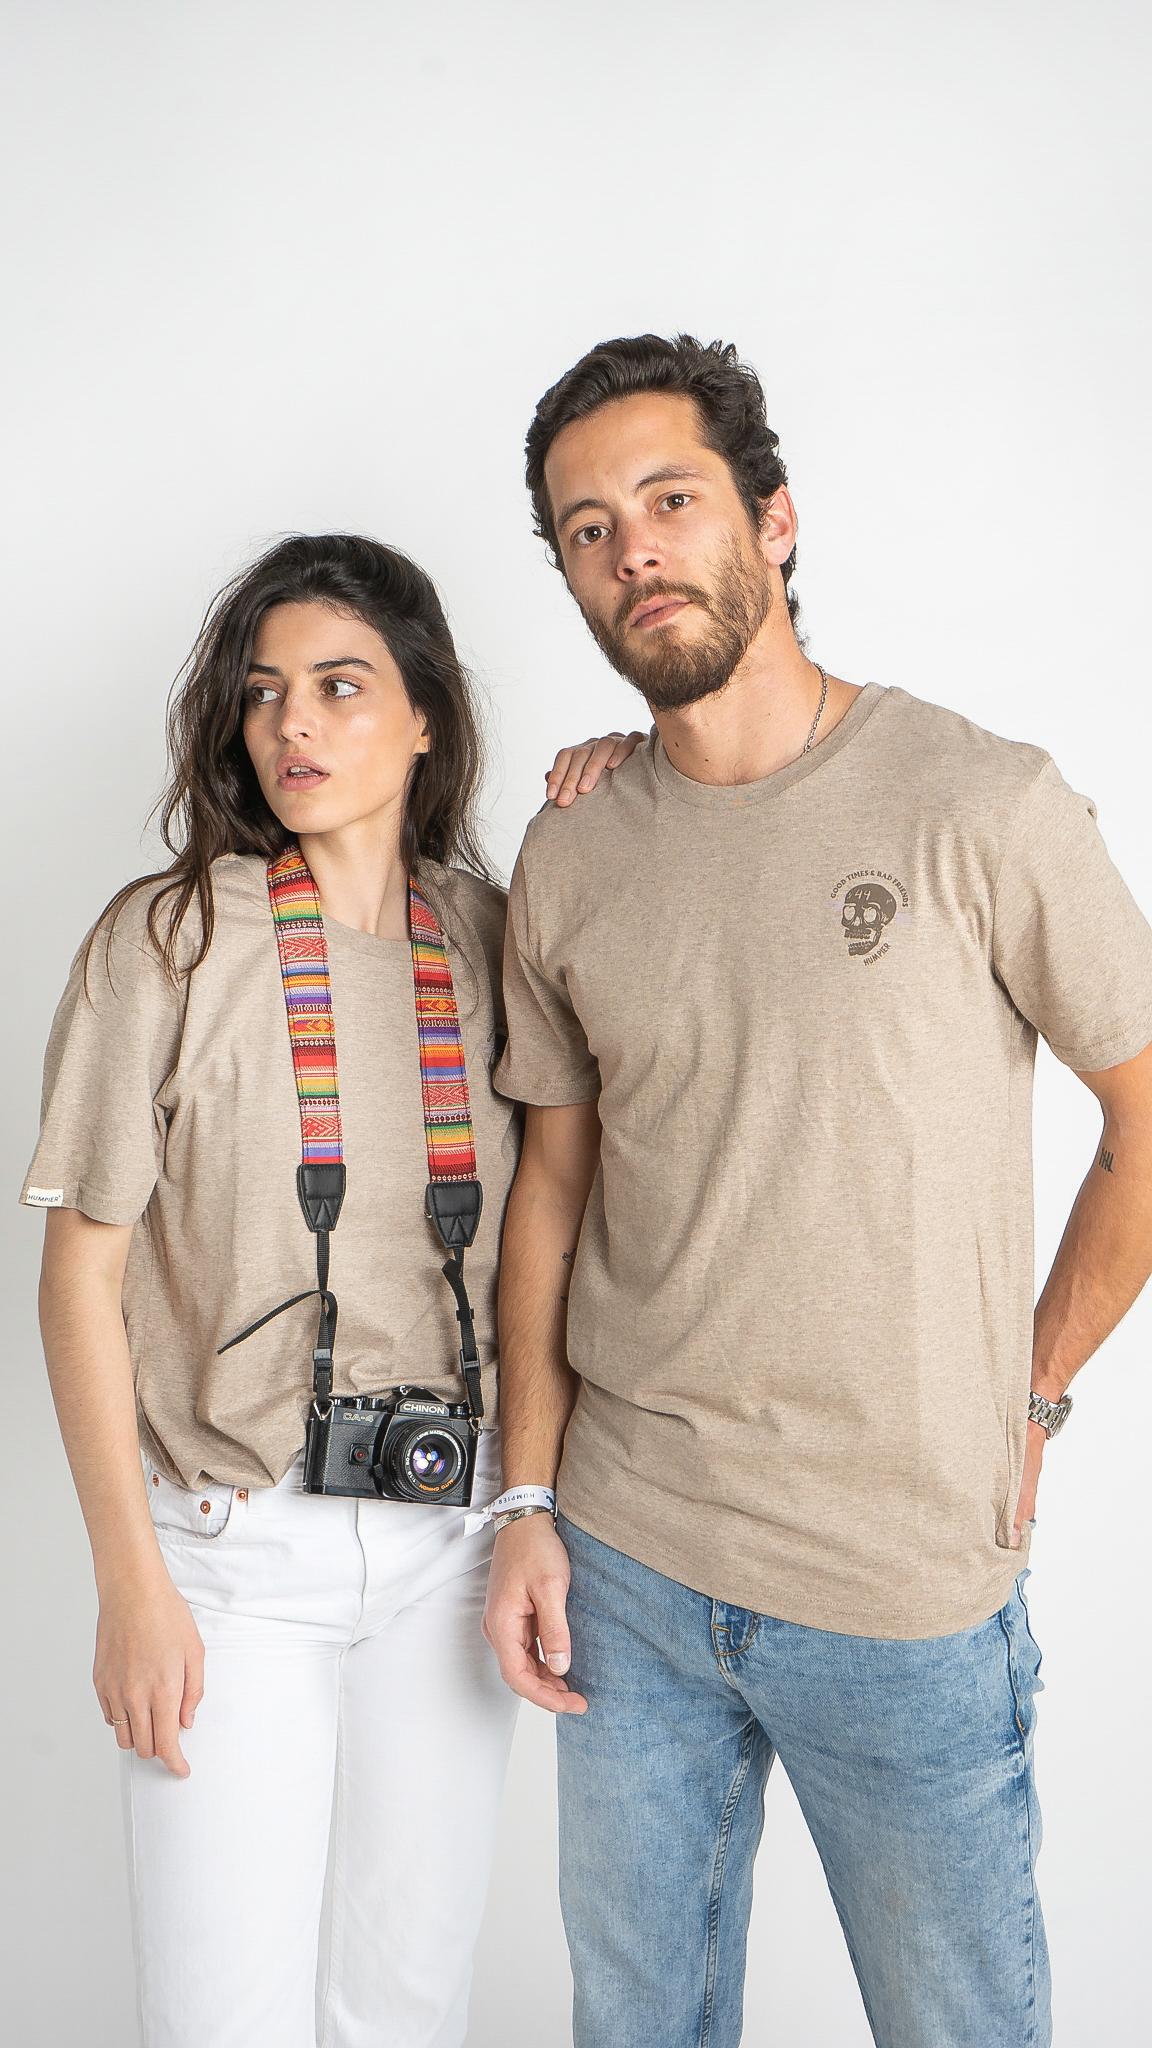 Camiseta Humpier Vinicunca | Humpier | Edición limitada